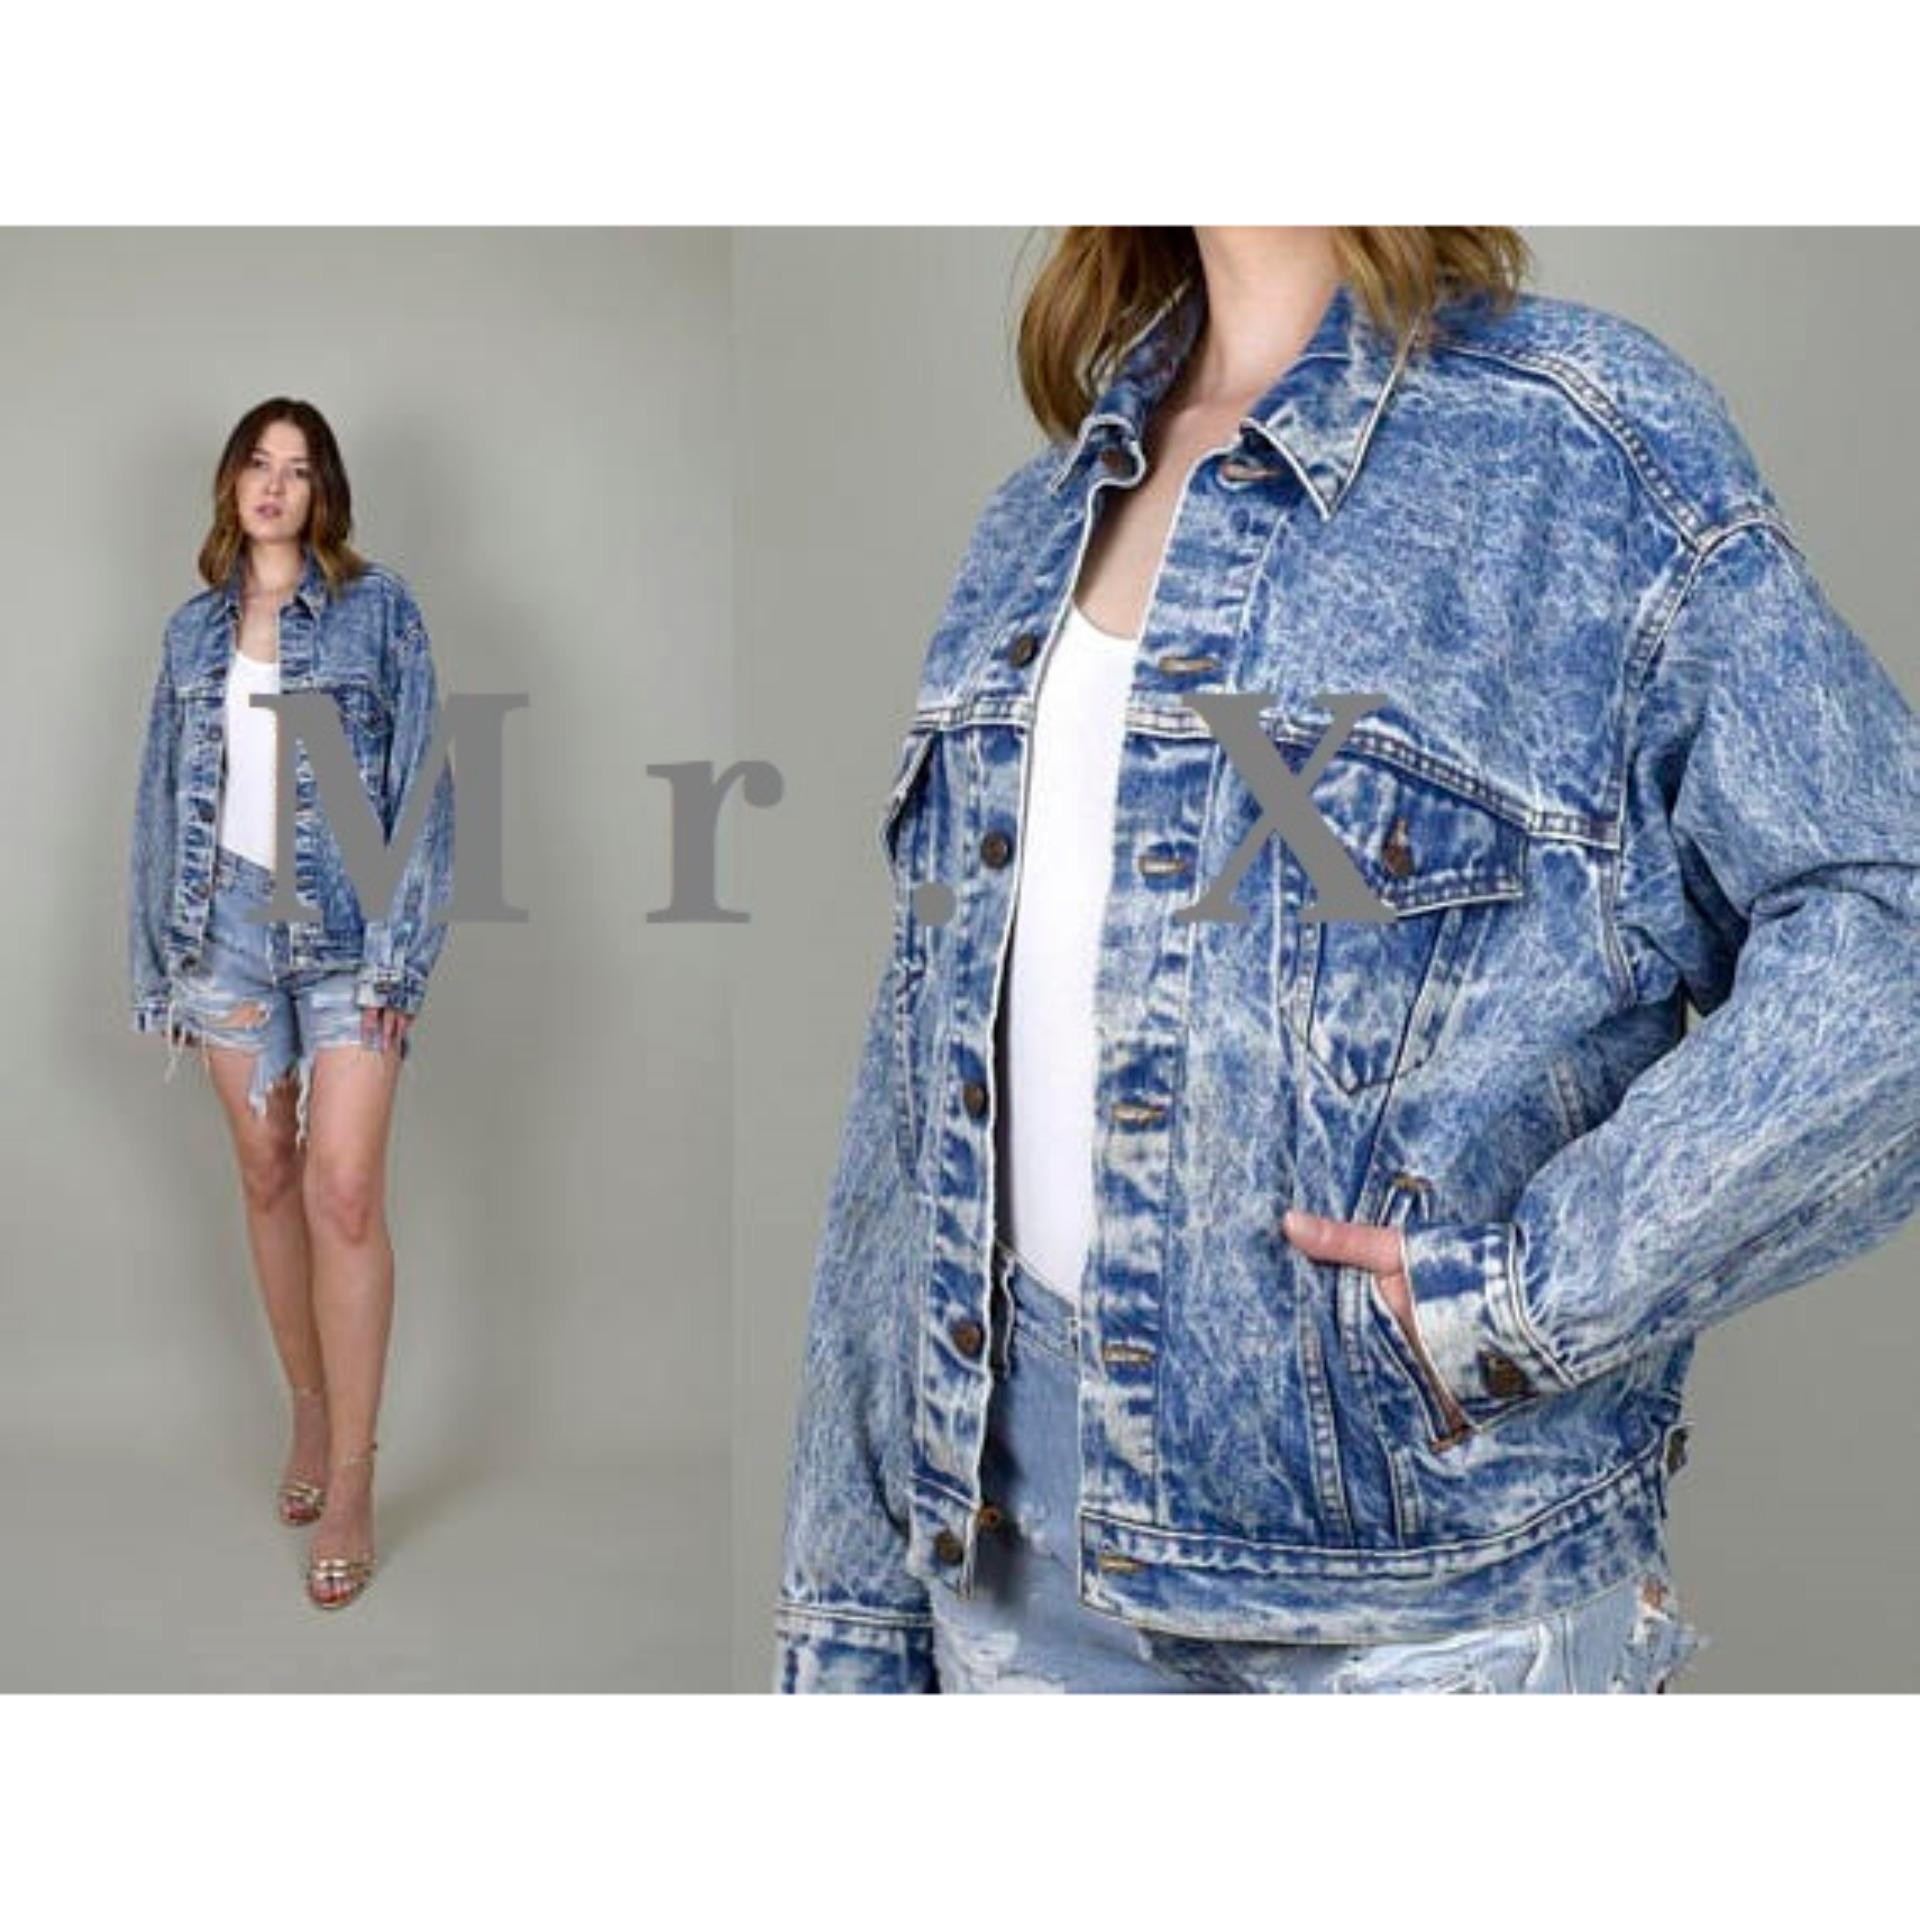 Jual Jaket Jeans Denim Oversize Wanita Blue Acidwash Biru Serpihan Putih Premium Quality By Mr X Import